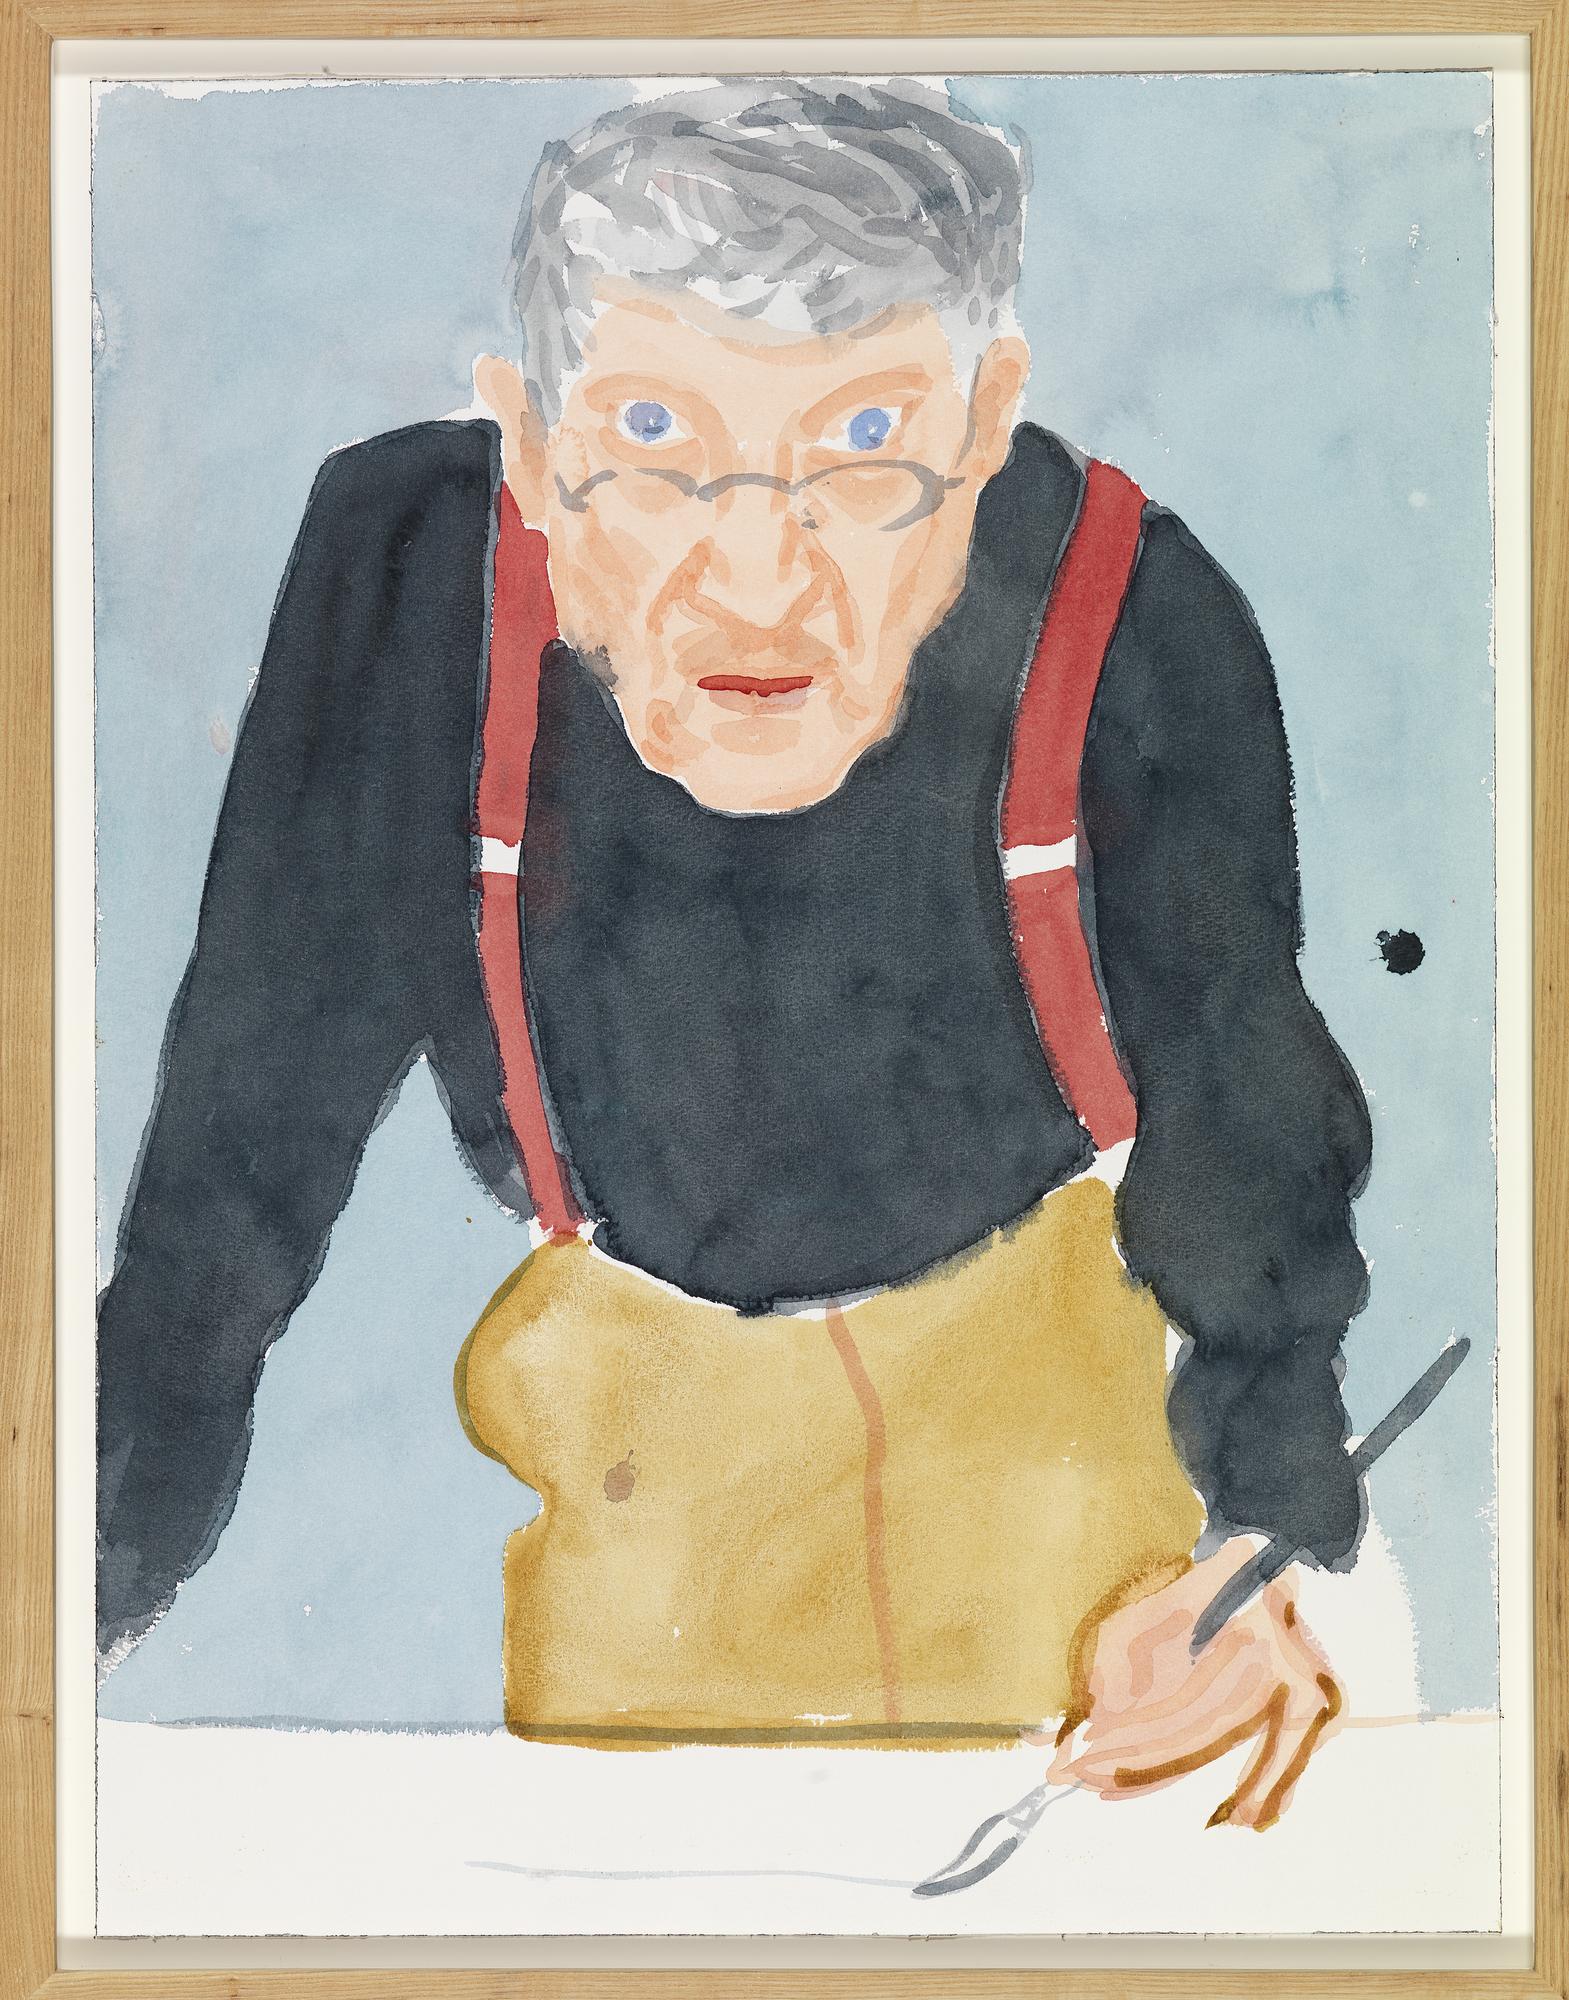 "David Hockney ""Self Portrait with Red Braces"" 2003 Watercolor on paper 24 x 18 1/8"" ©David Hockney Photo Credit: Richard Schmidt"